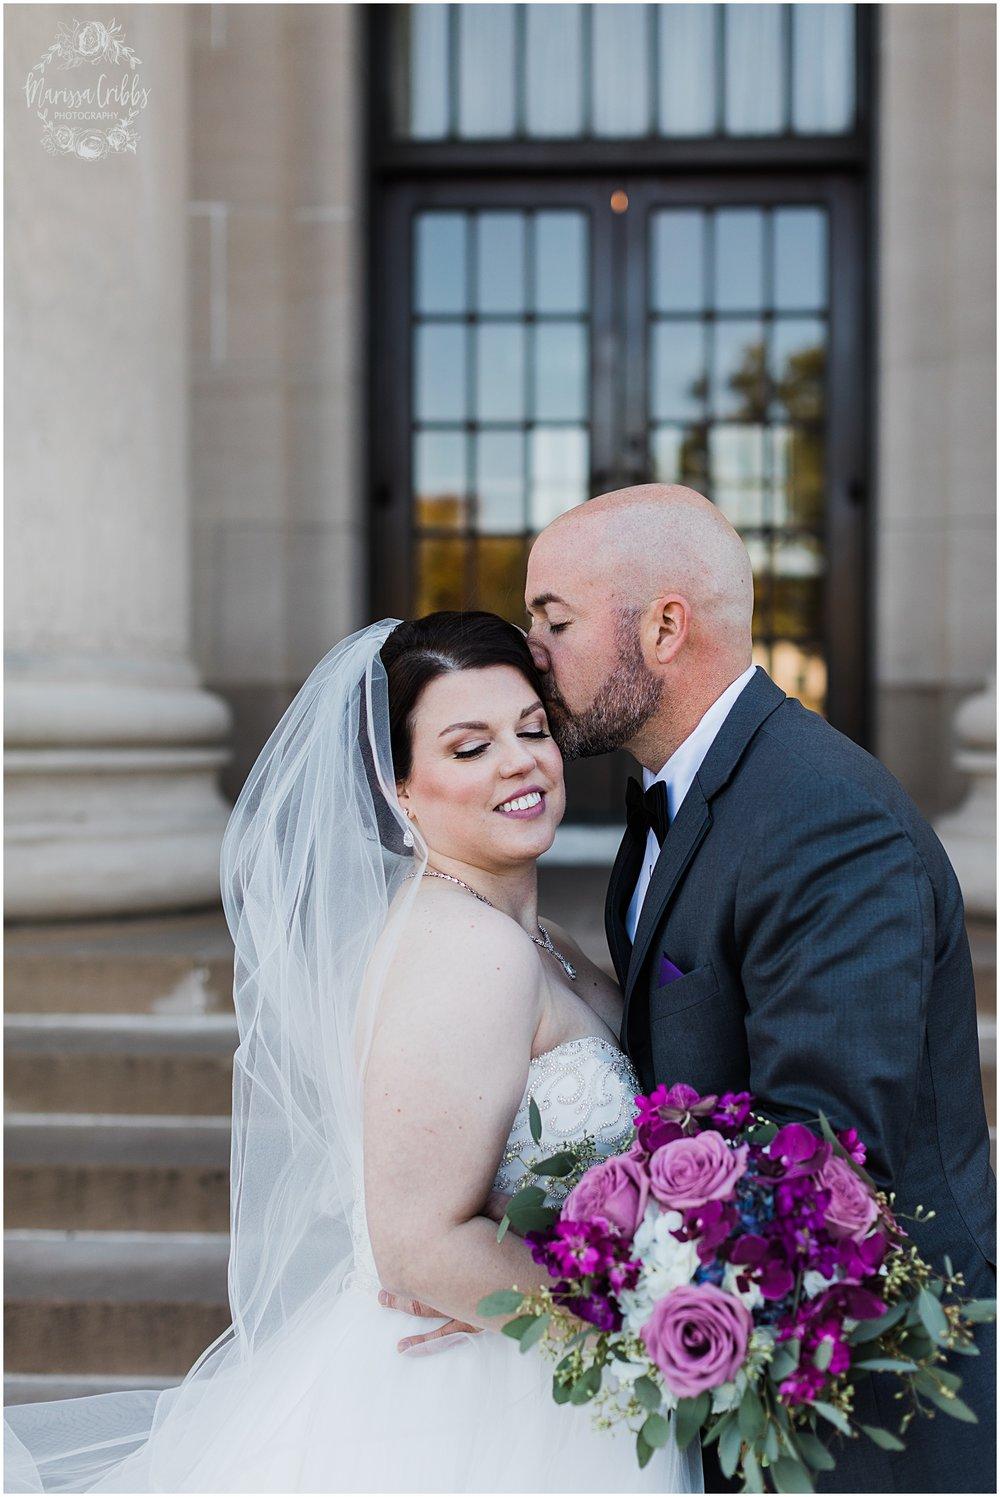 LAURA & DAN MARRIED | NELSON ATKINS MUSEUM | MARISSA CRIBBS PHOTOGRAPHY_7000.jpg